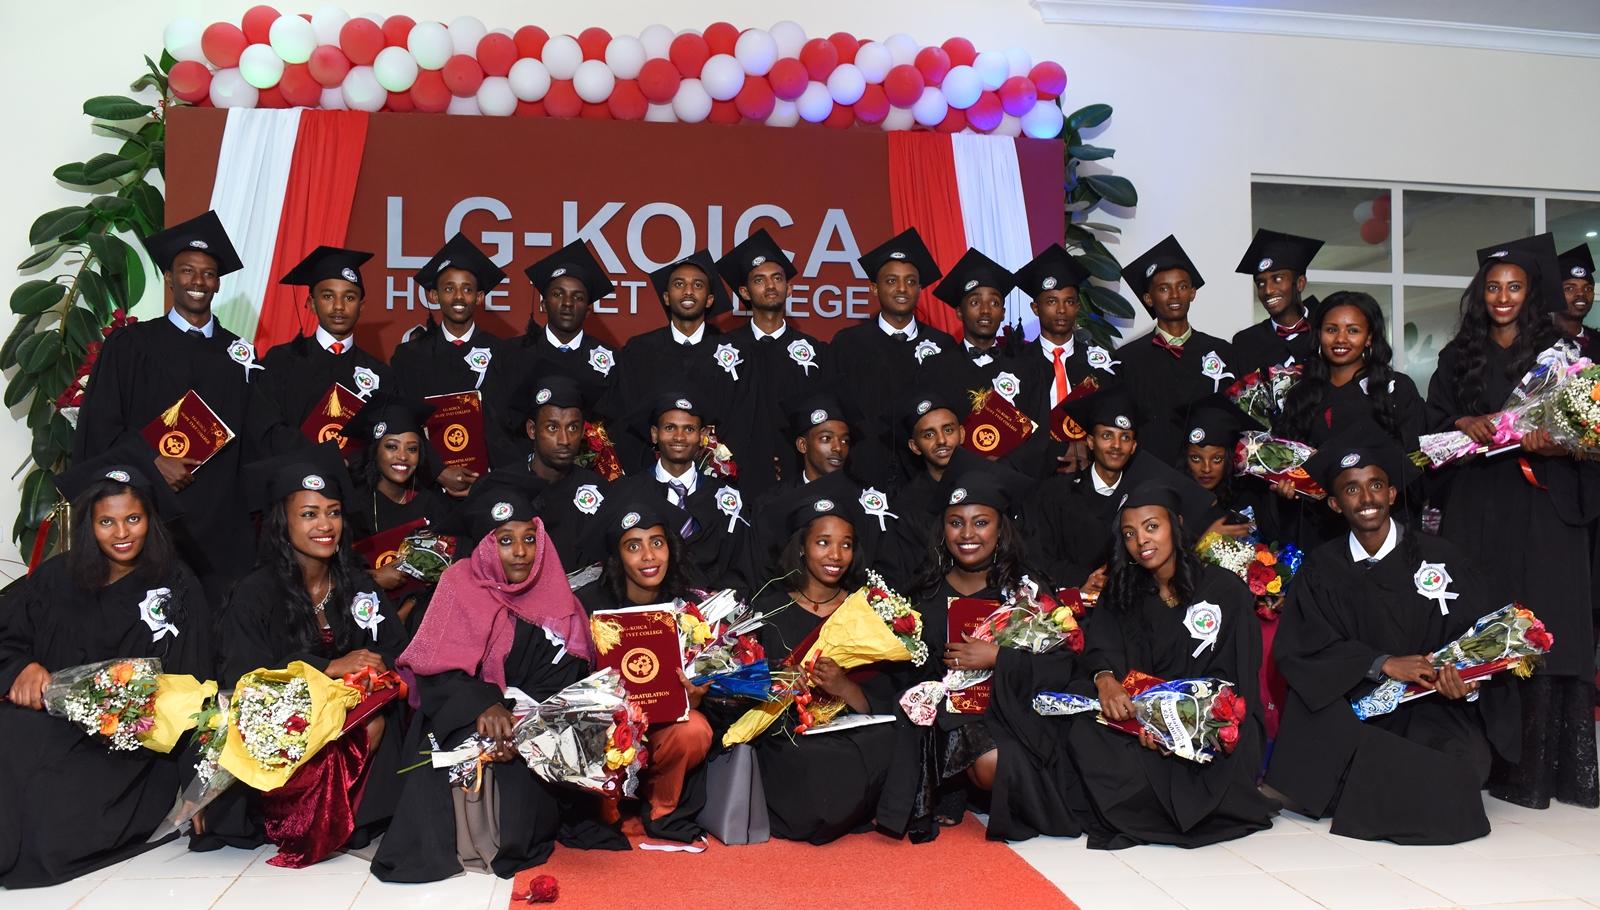 LG전자가 1일 에티오피아 수도 아디스아바바에 있는 「LG-KOICA 희망직업훈련학교」에서 '제3회 LG-KOICA 희망직업훈련학교 졸업식'을 개최했다.